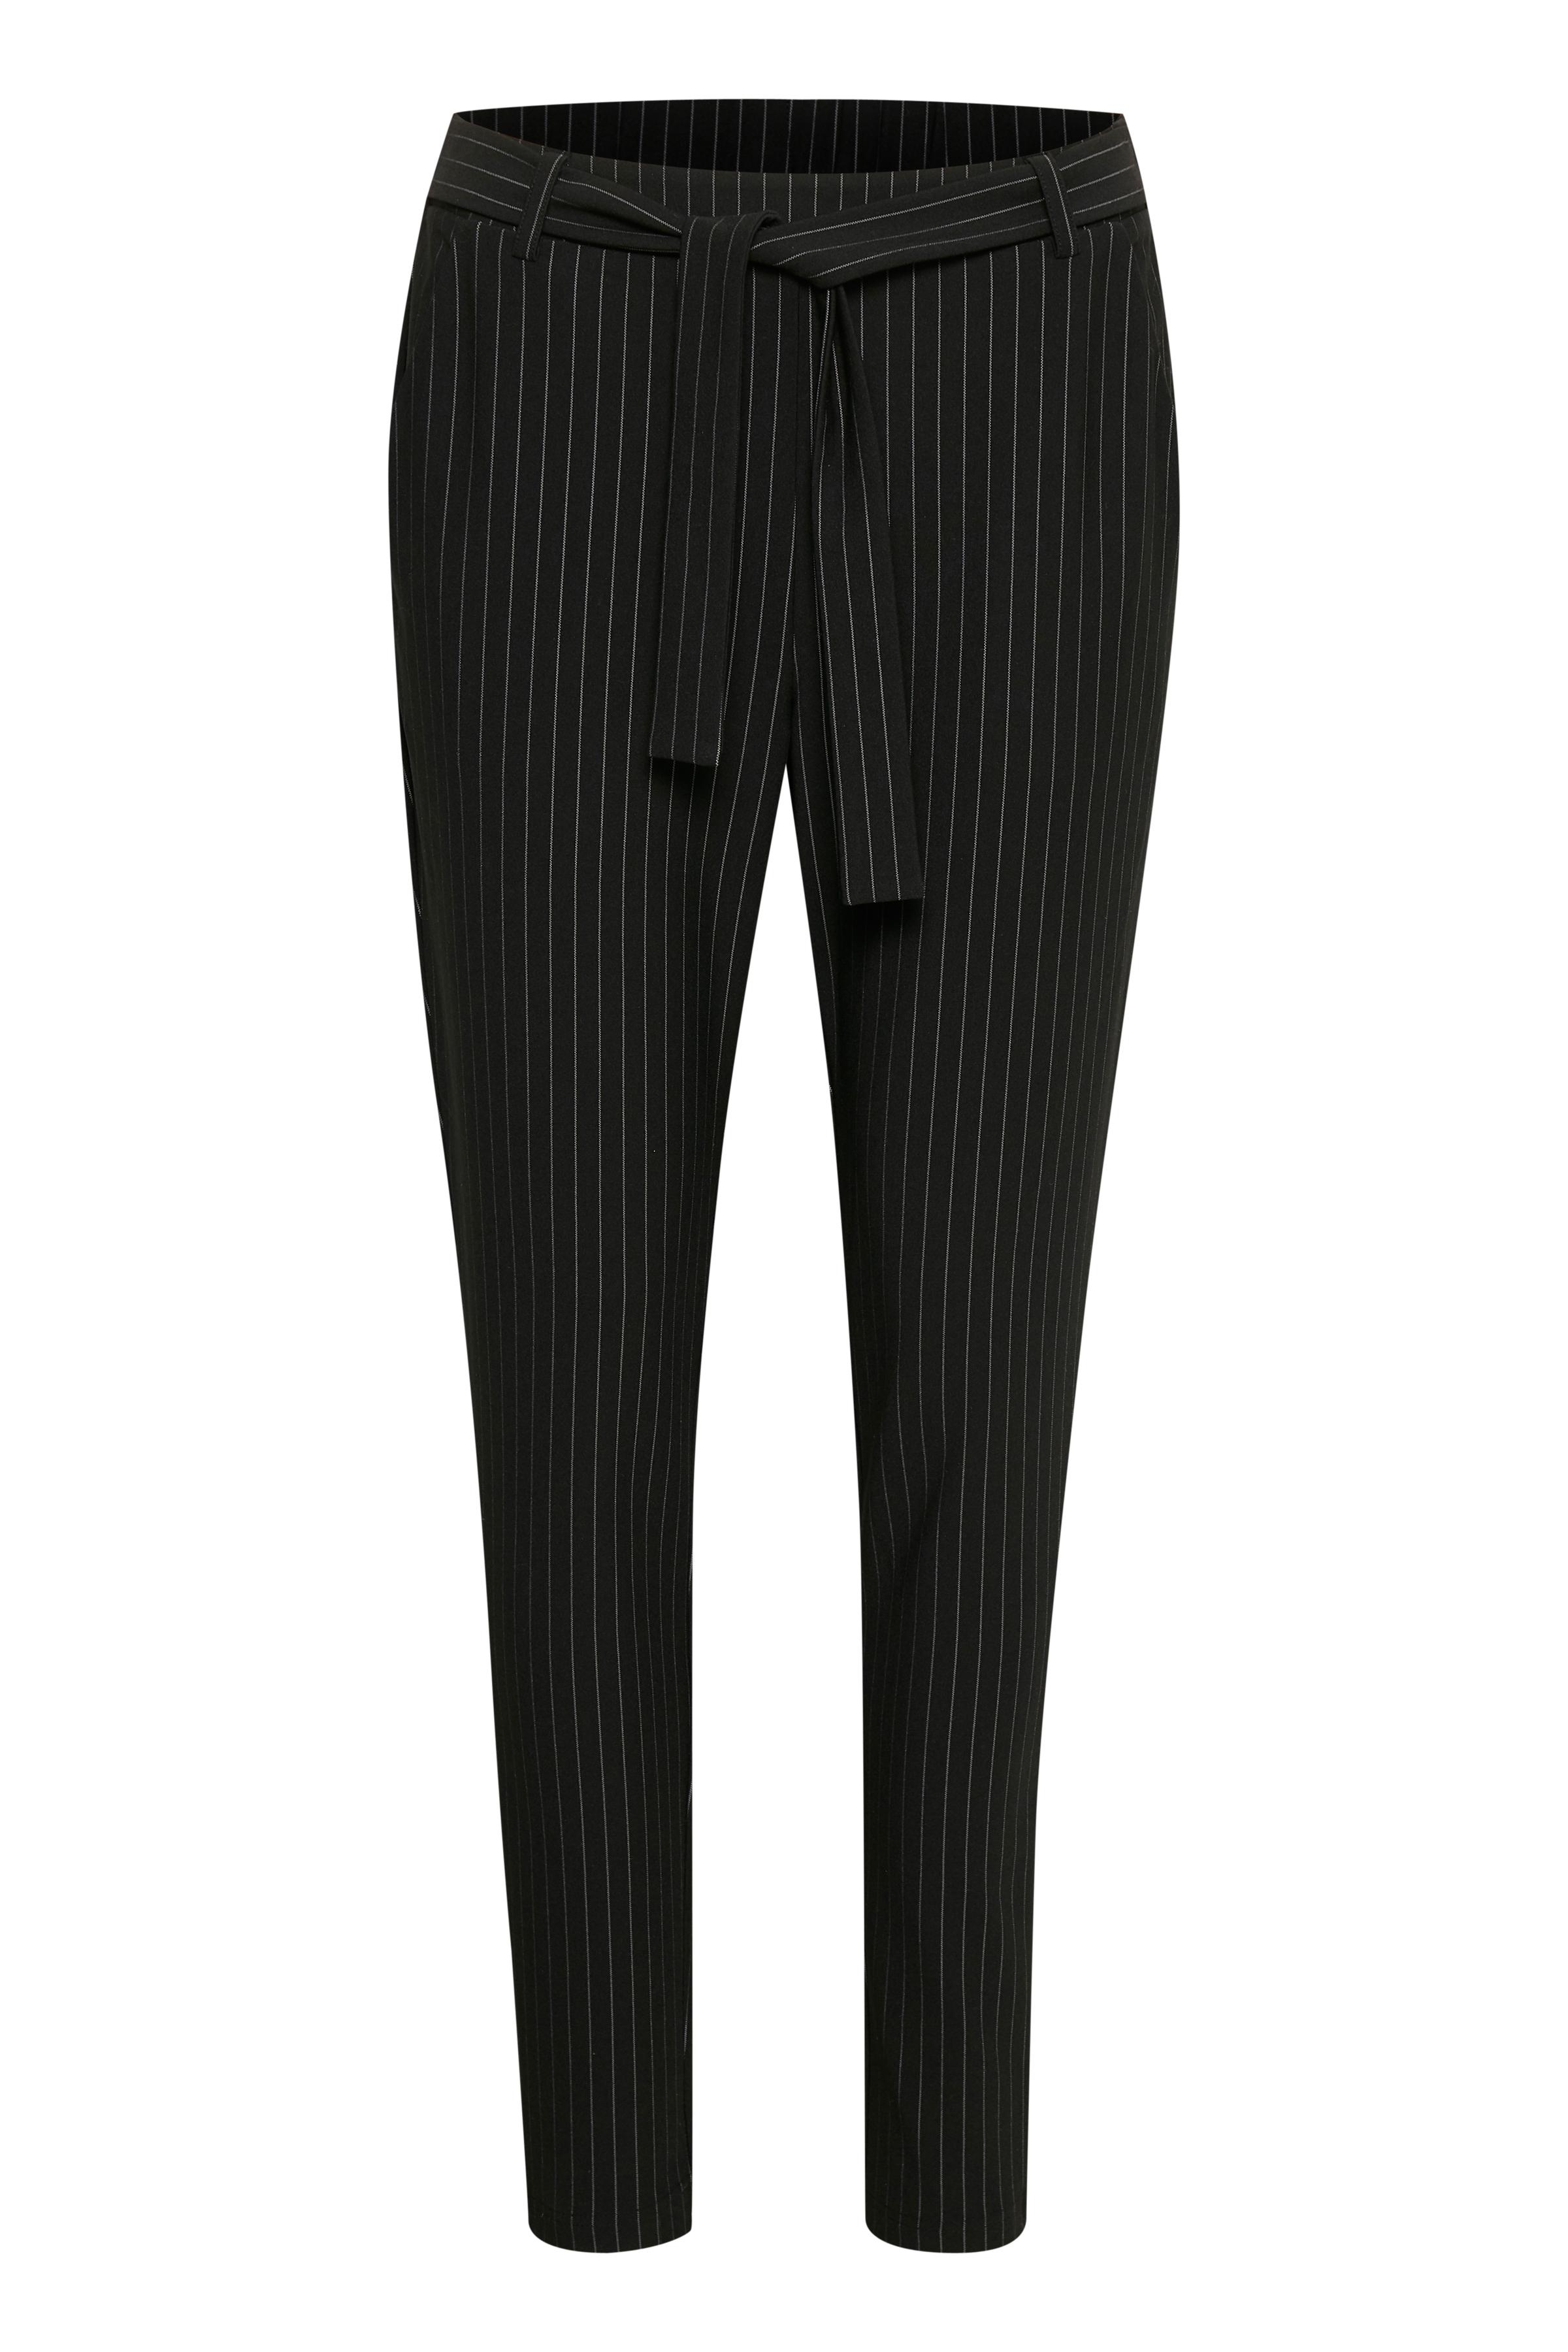 Sort Casual bukser fra Cream – Køb Sort Casual bukser fra str. XS-XXL her